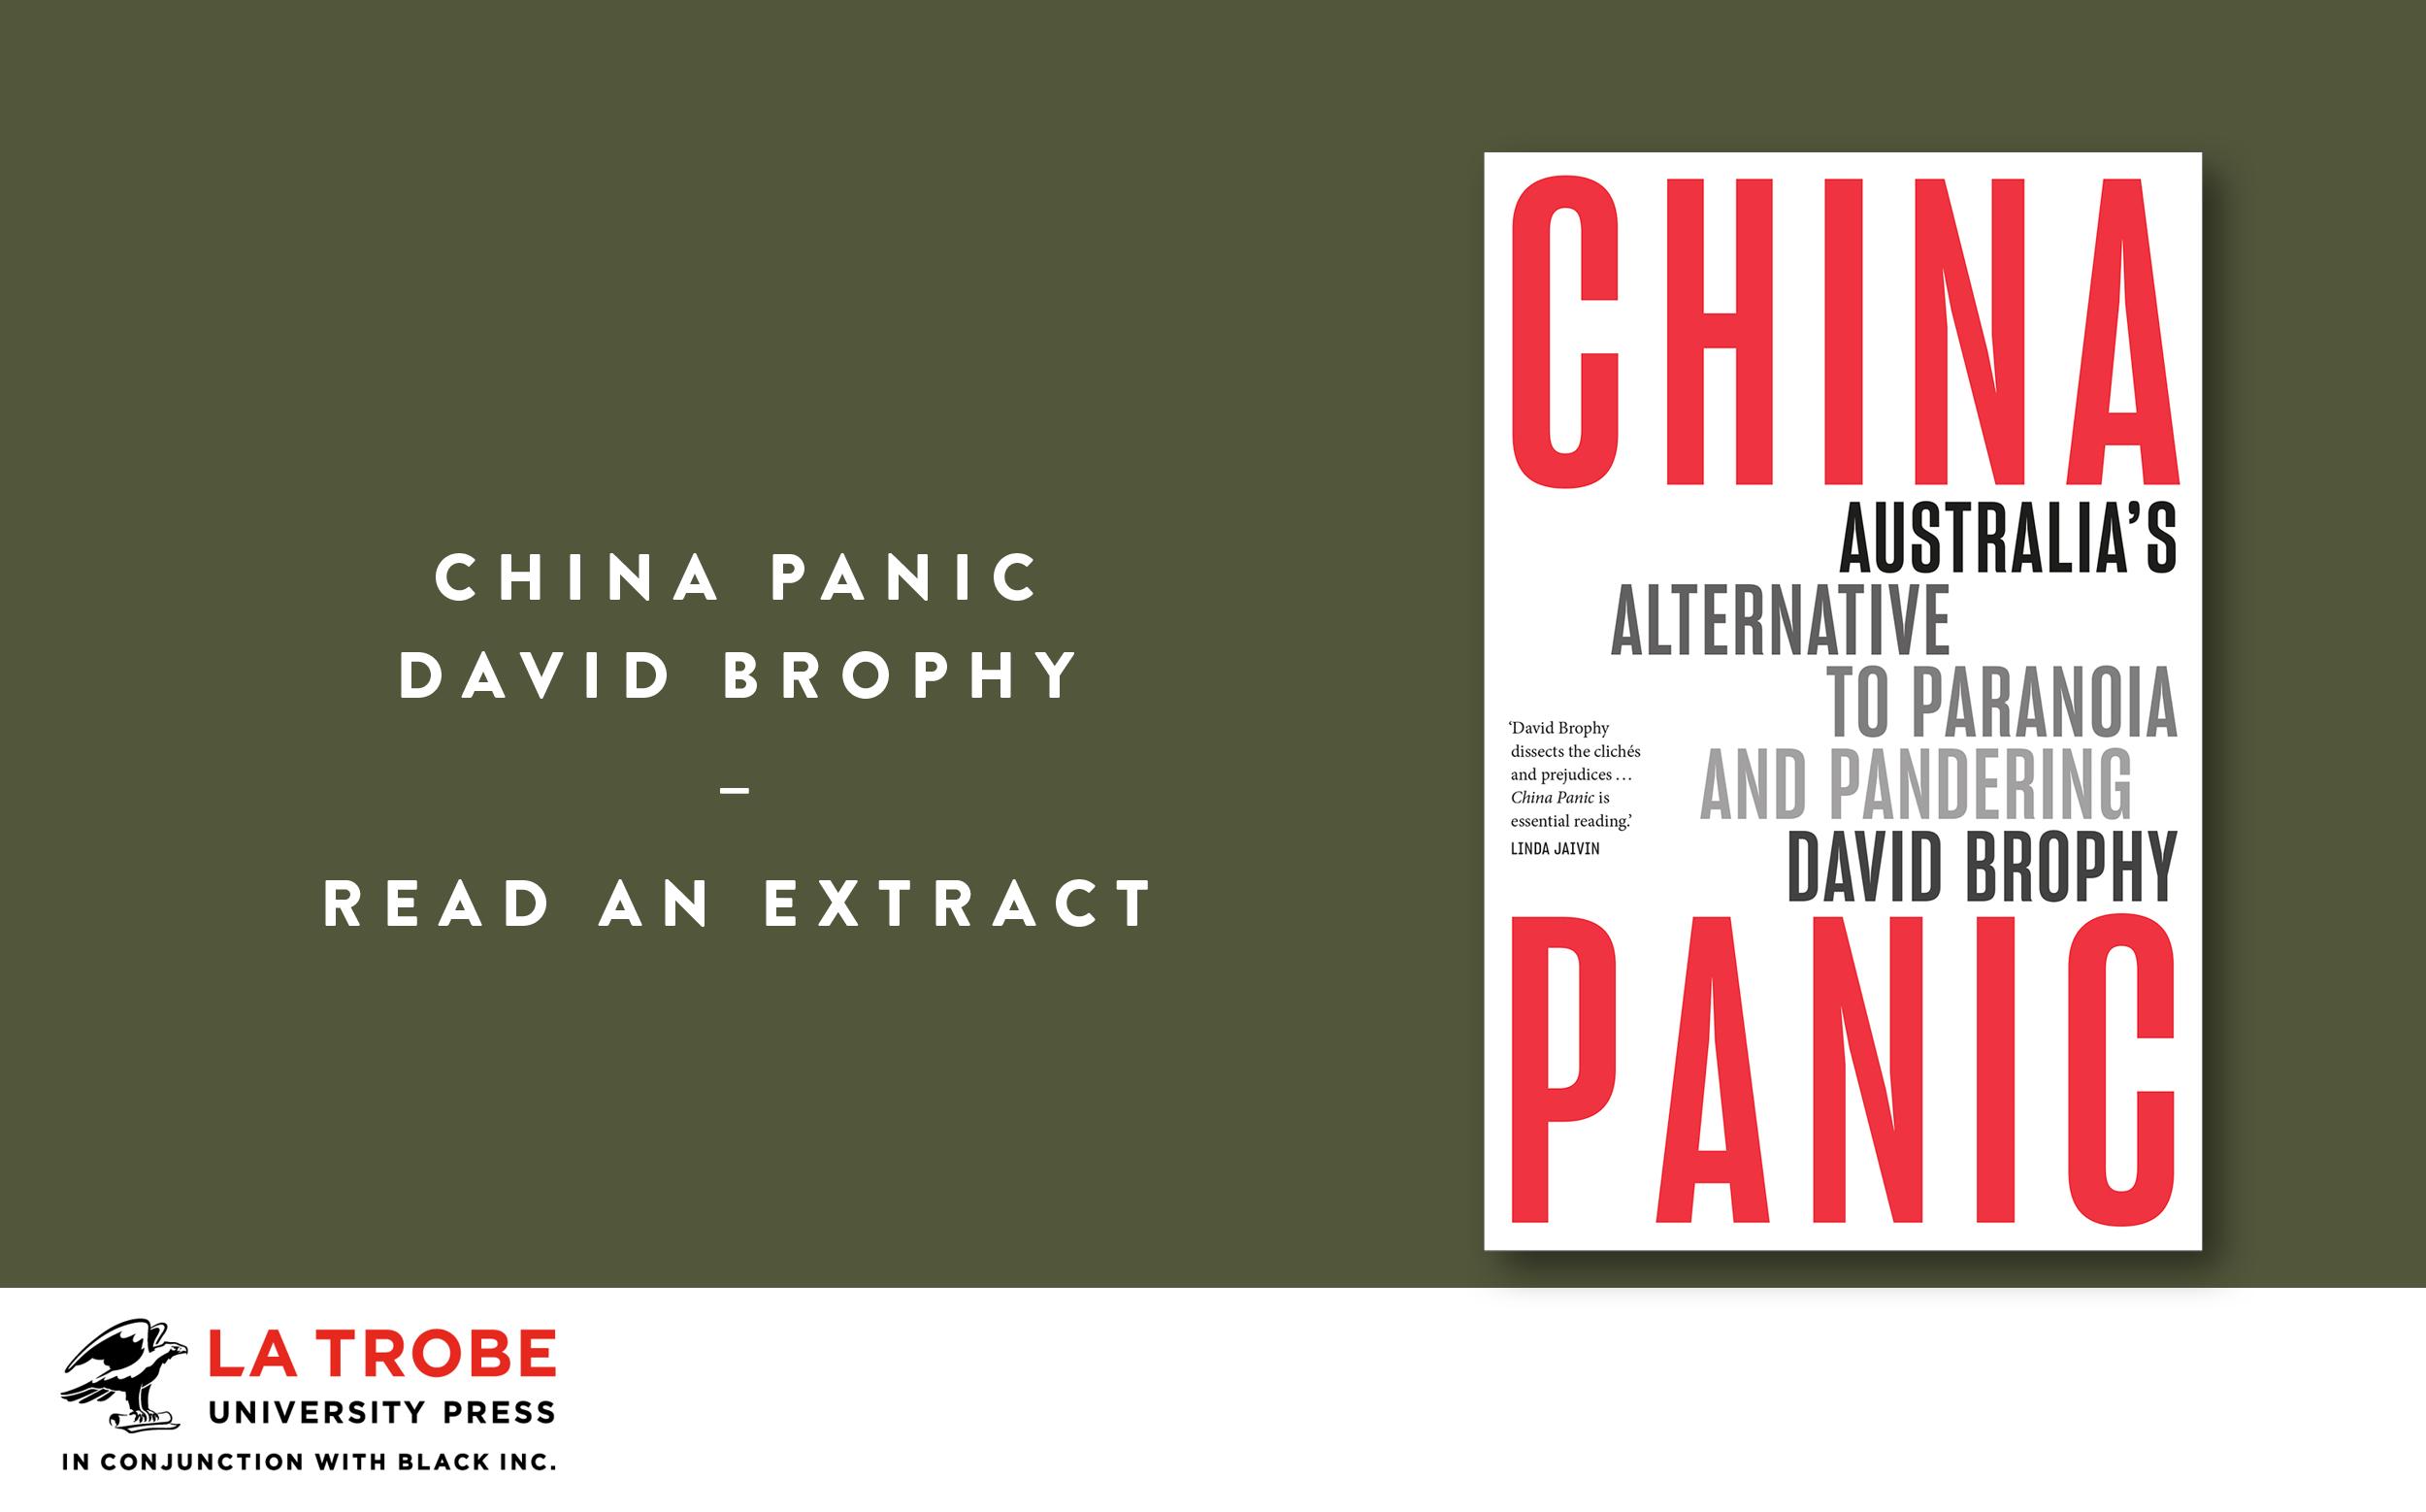 Read an extract: China Panic